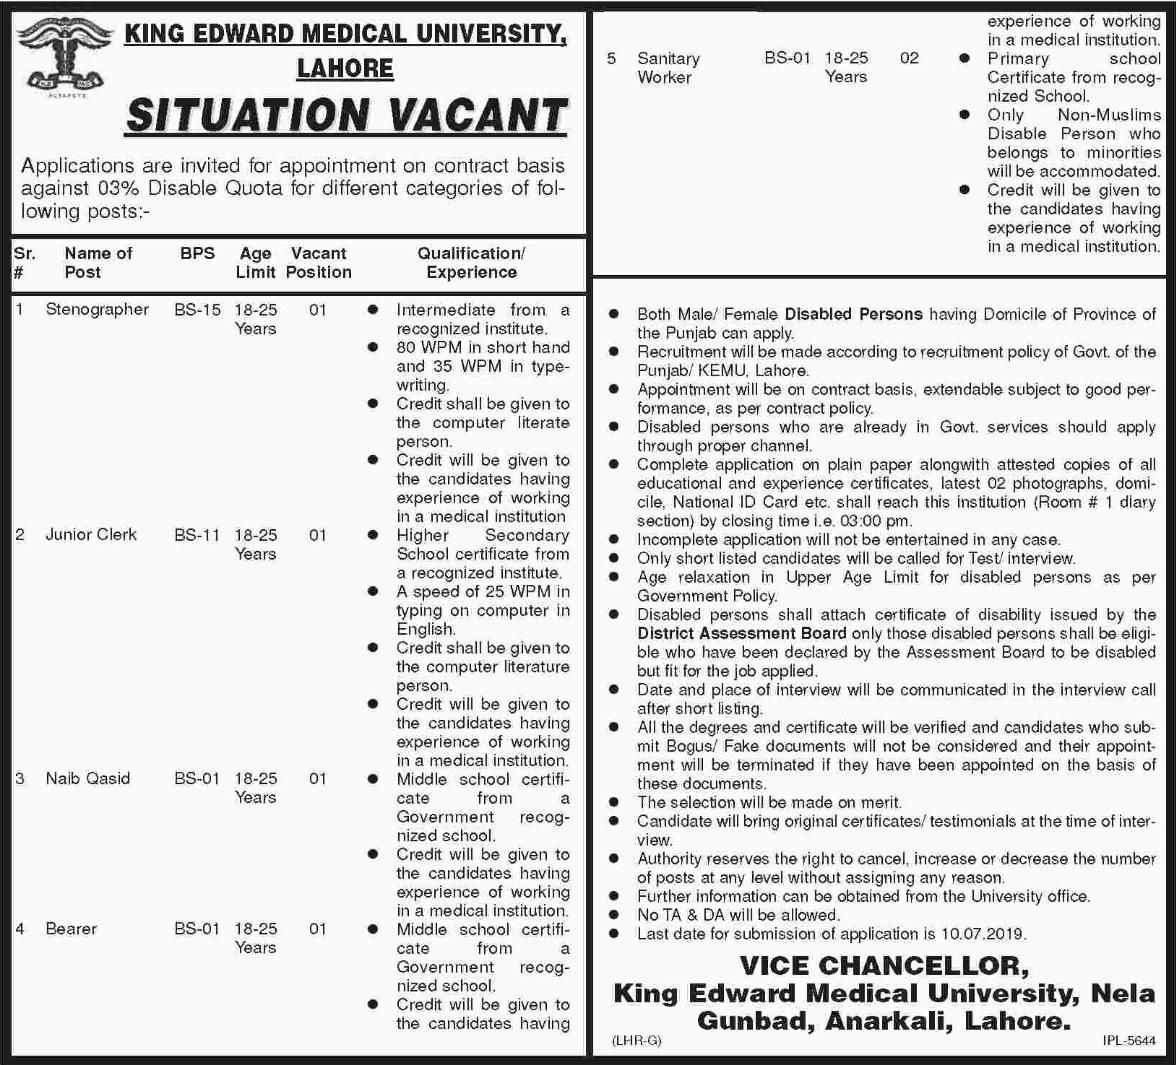 King Edward Medical University Job in Lahore 2019